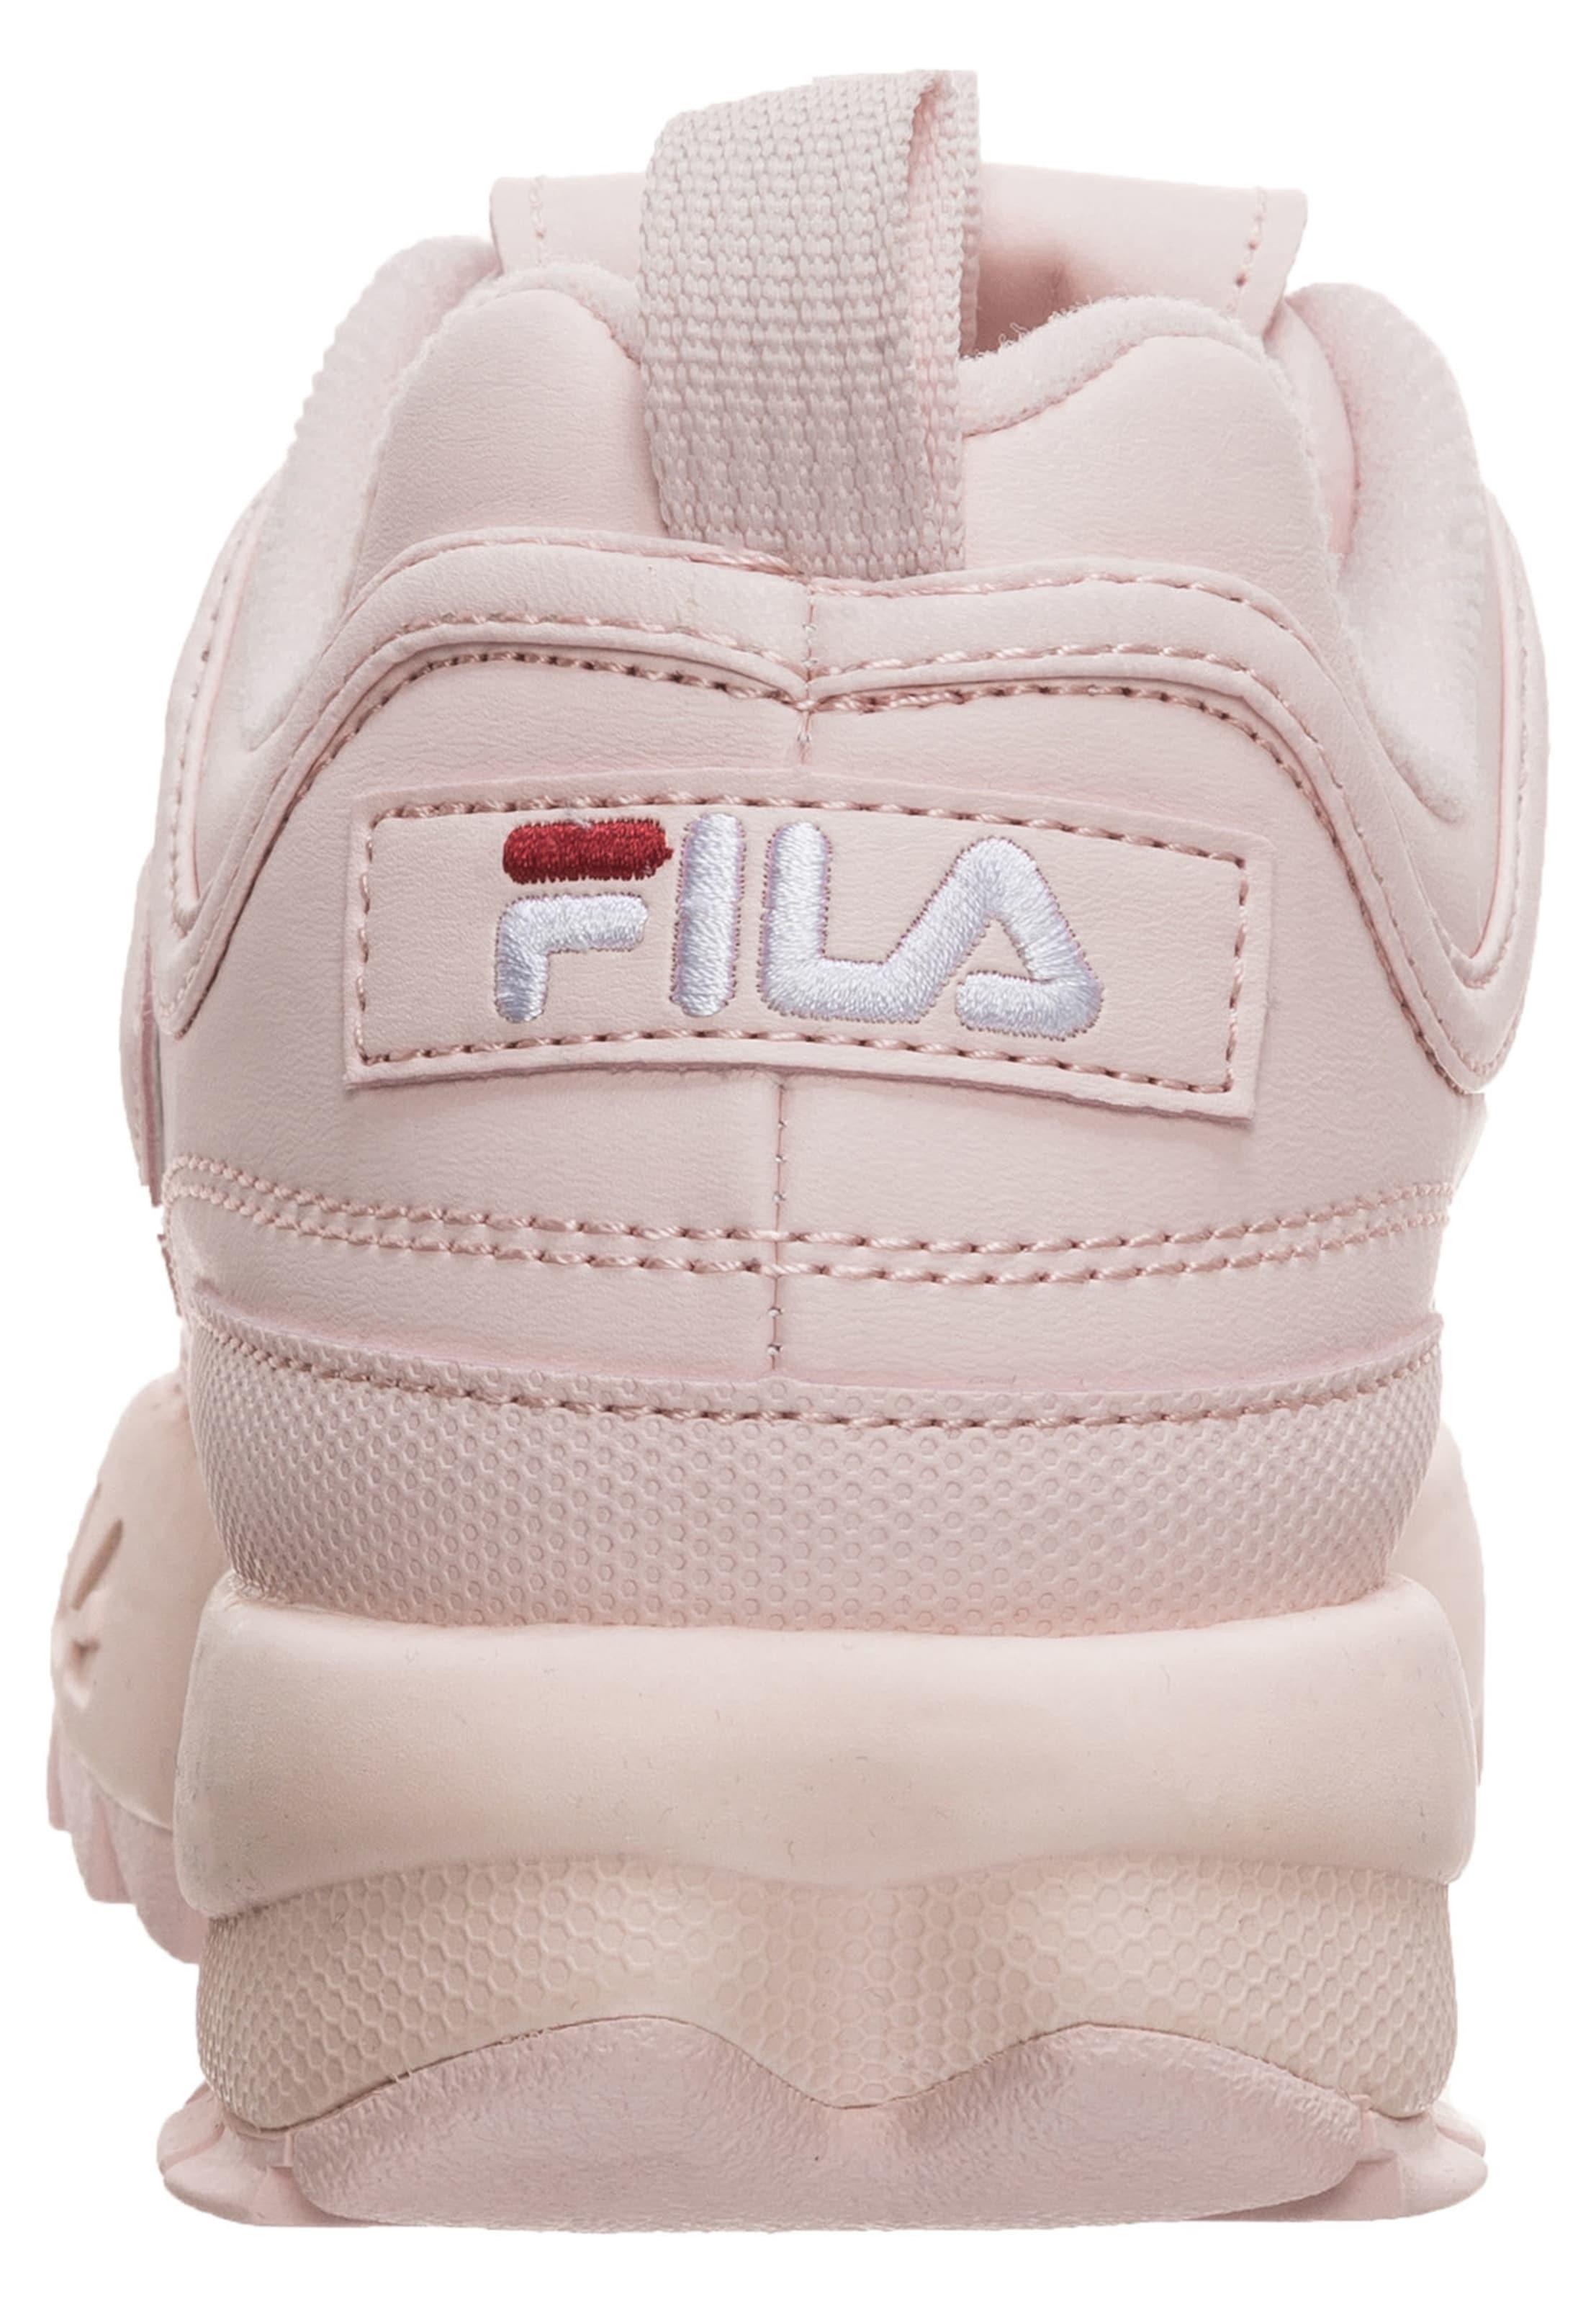 Fila Fila In Rosa 'disruptor' Rosa Sneaker In Sneaker 'disruptor' Fila drsCthQ